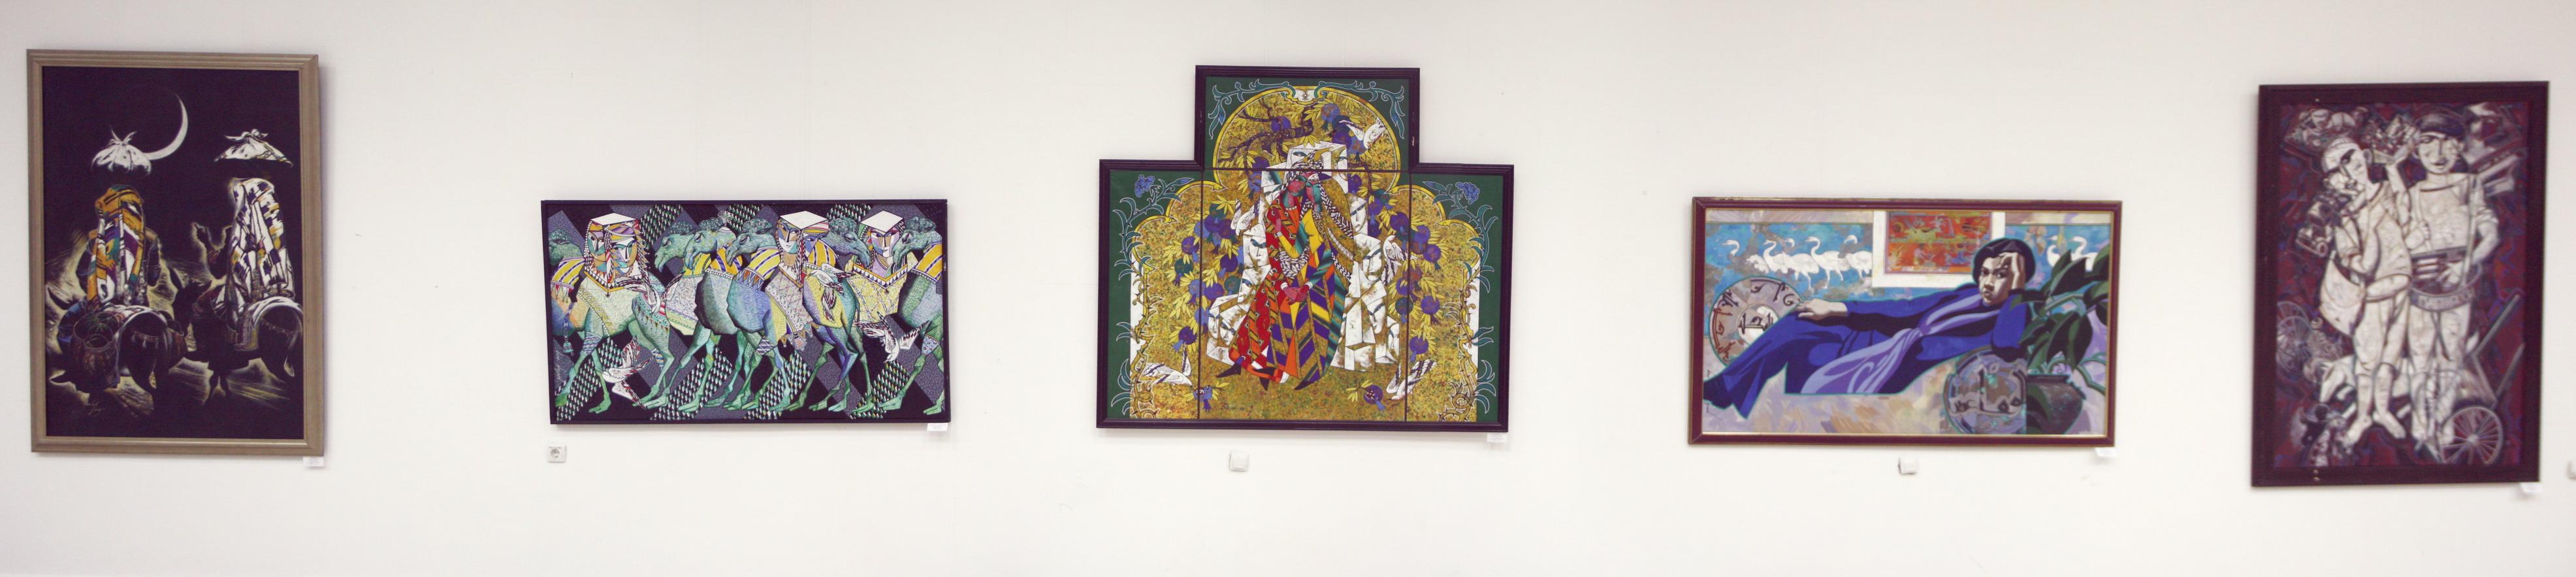 Джавлон Умарбеков. Экспозиция картин.